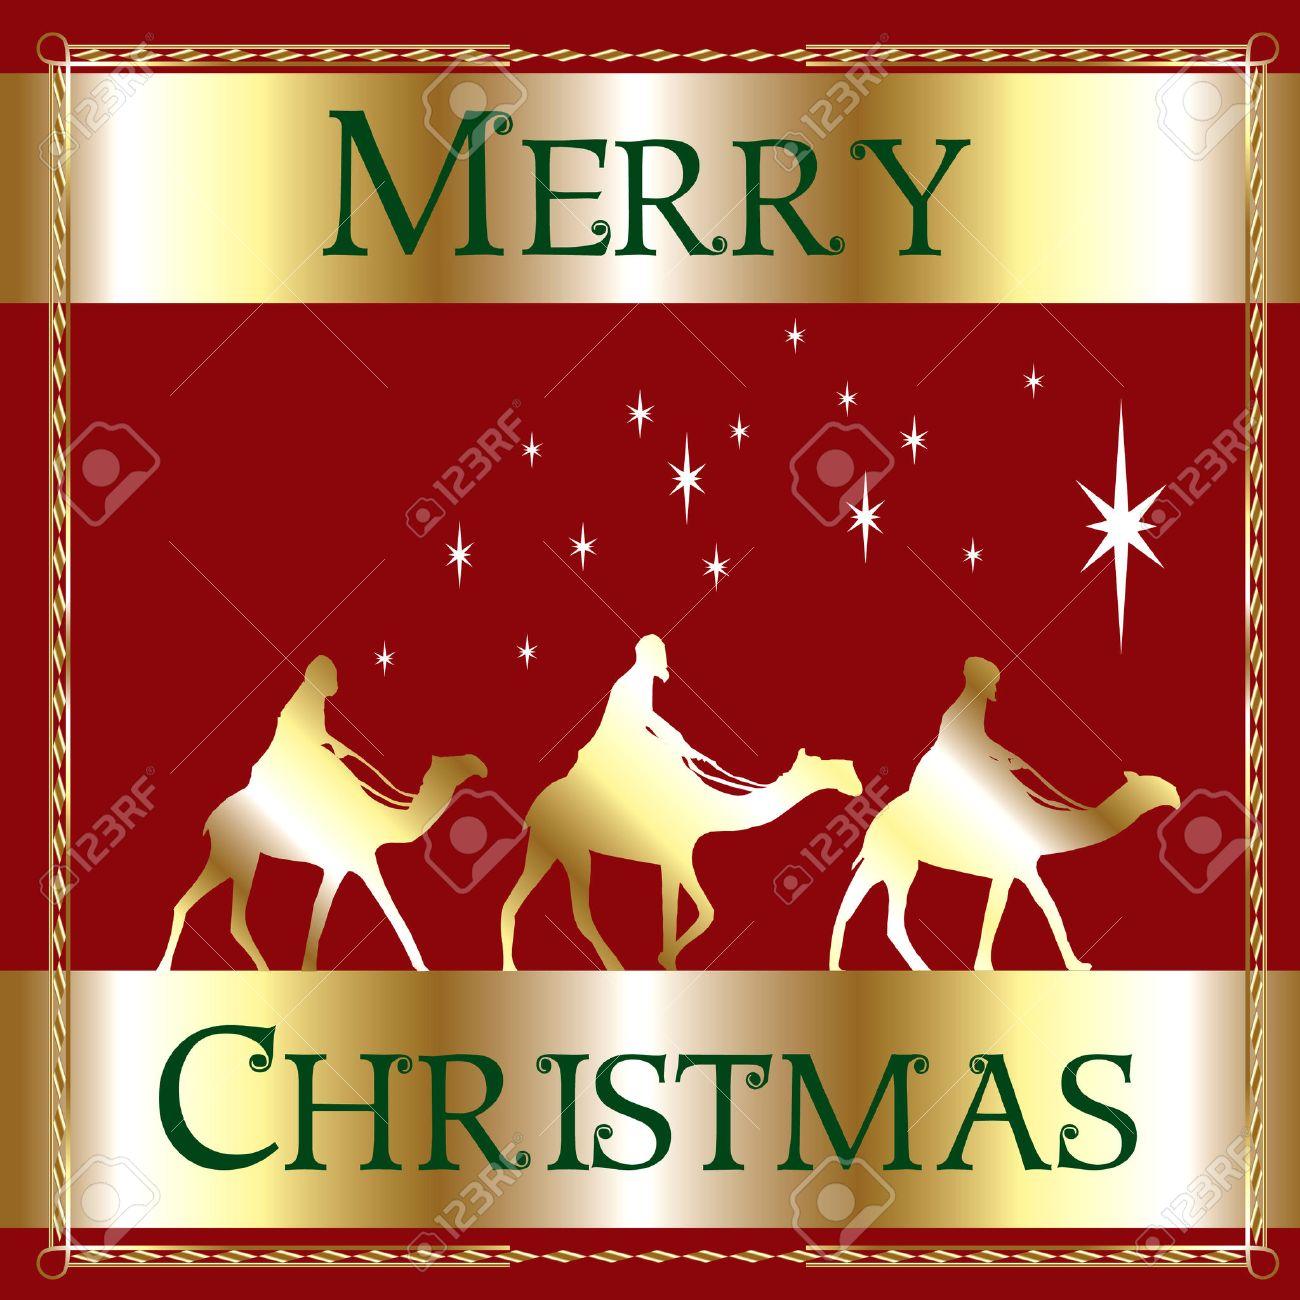 Merry Christmas Religious.A Merry Christmas Wisemen